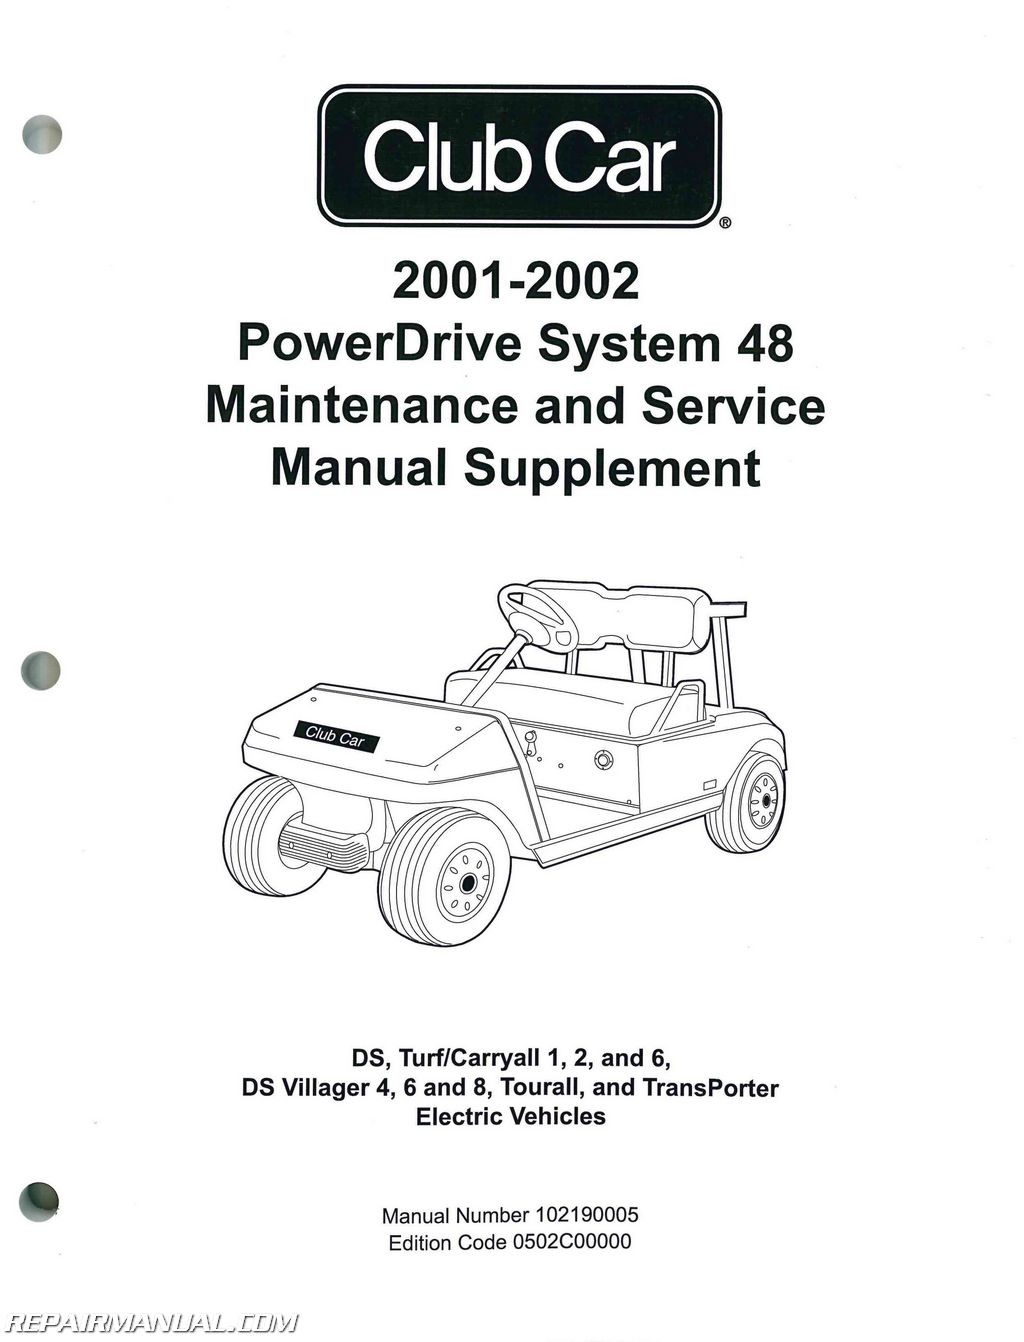 Gas Club Car Wiring Diagrams Manual Guide